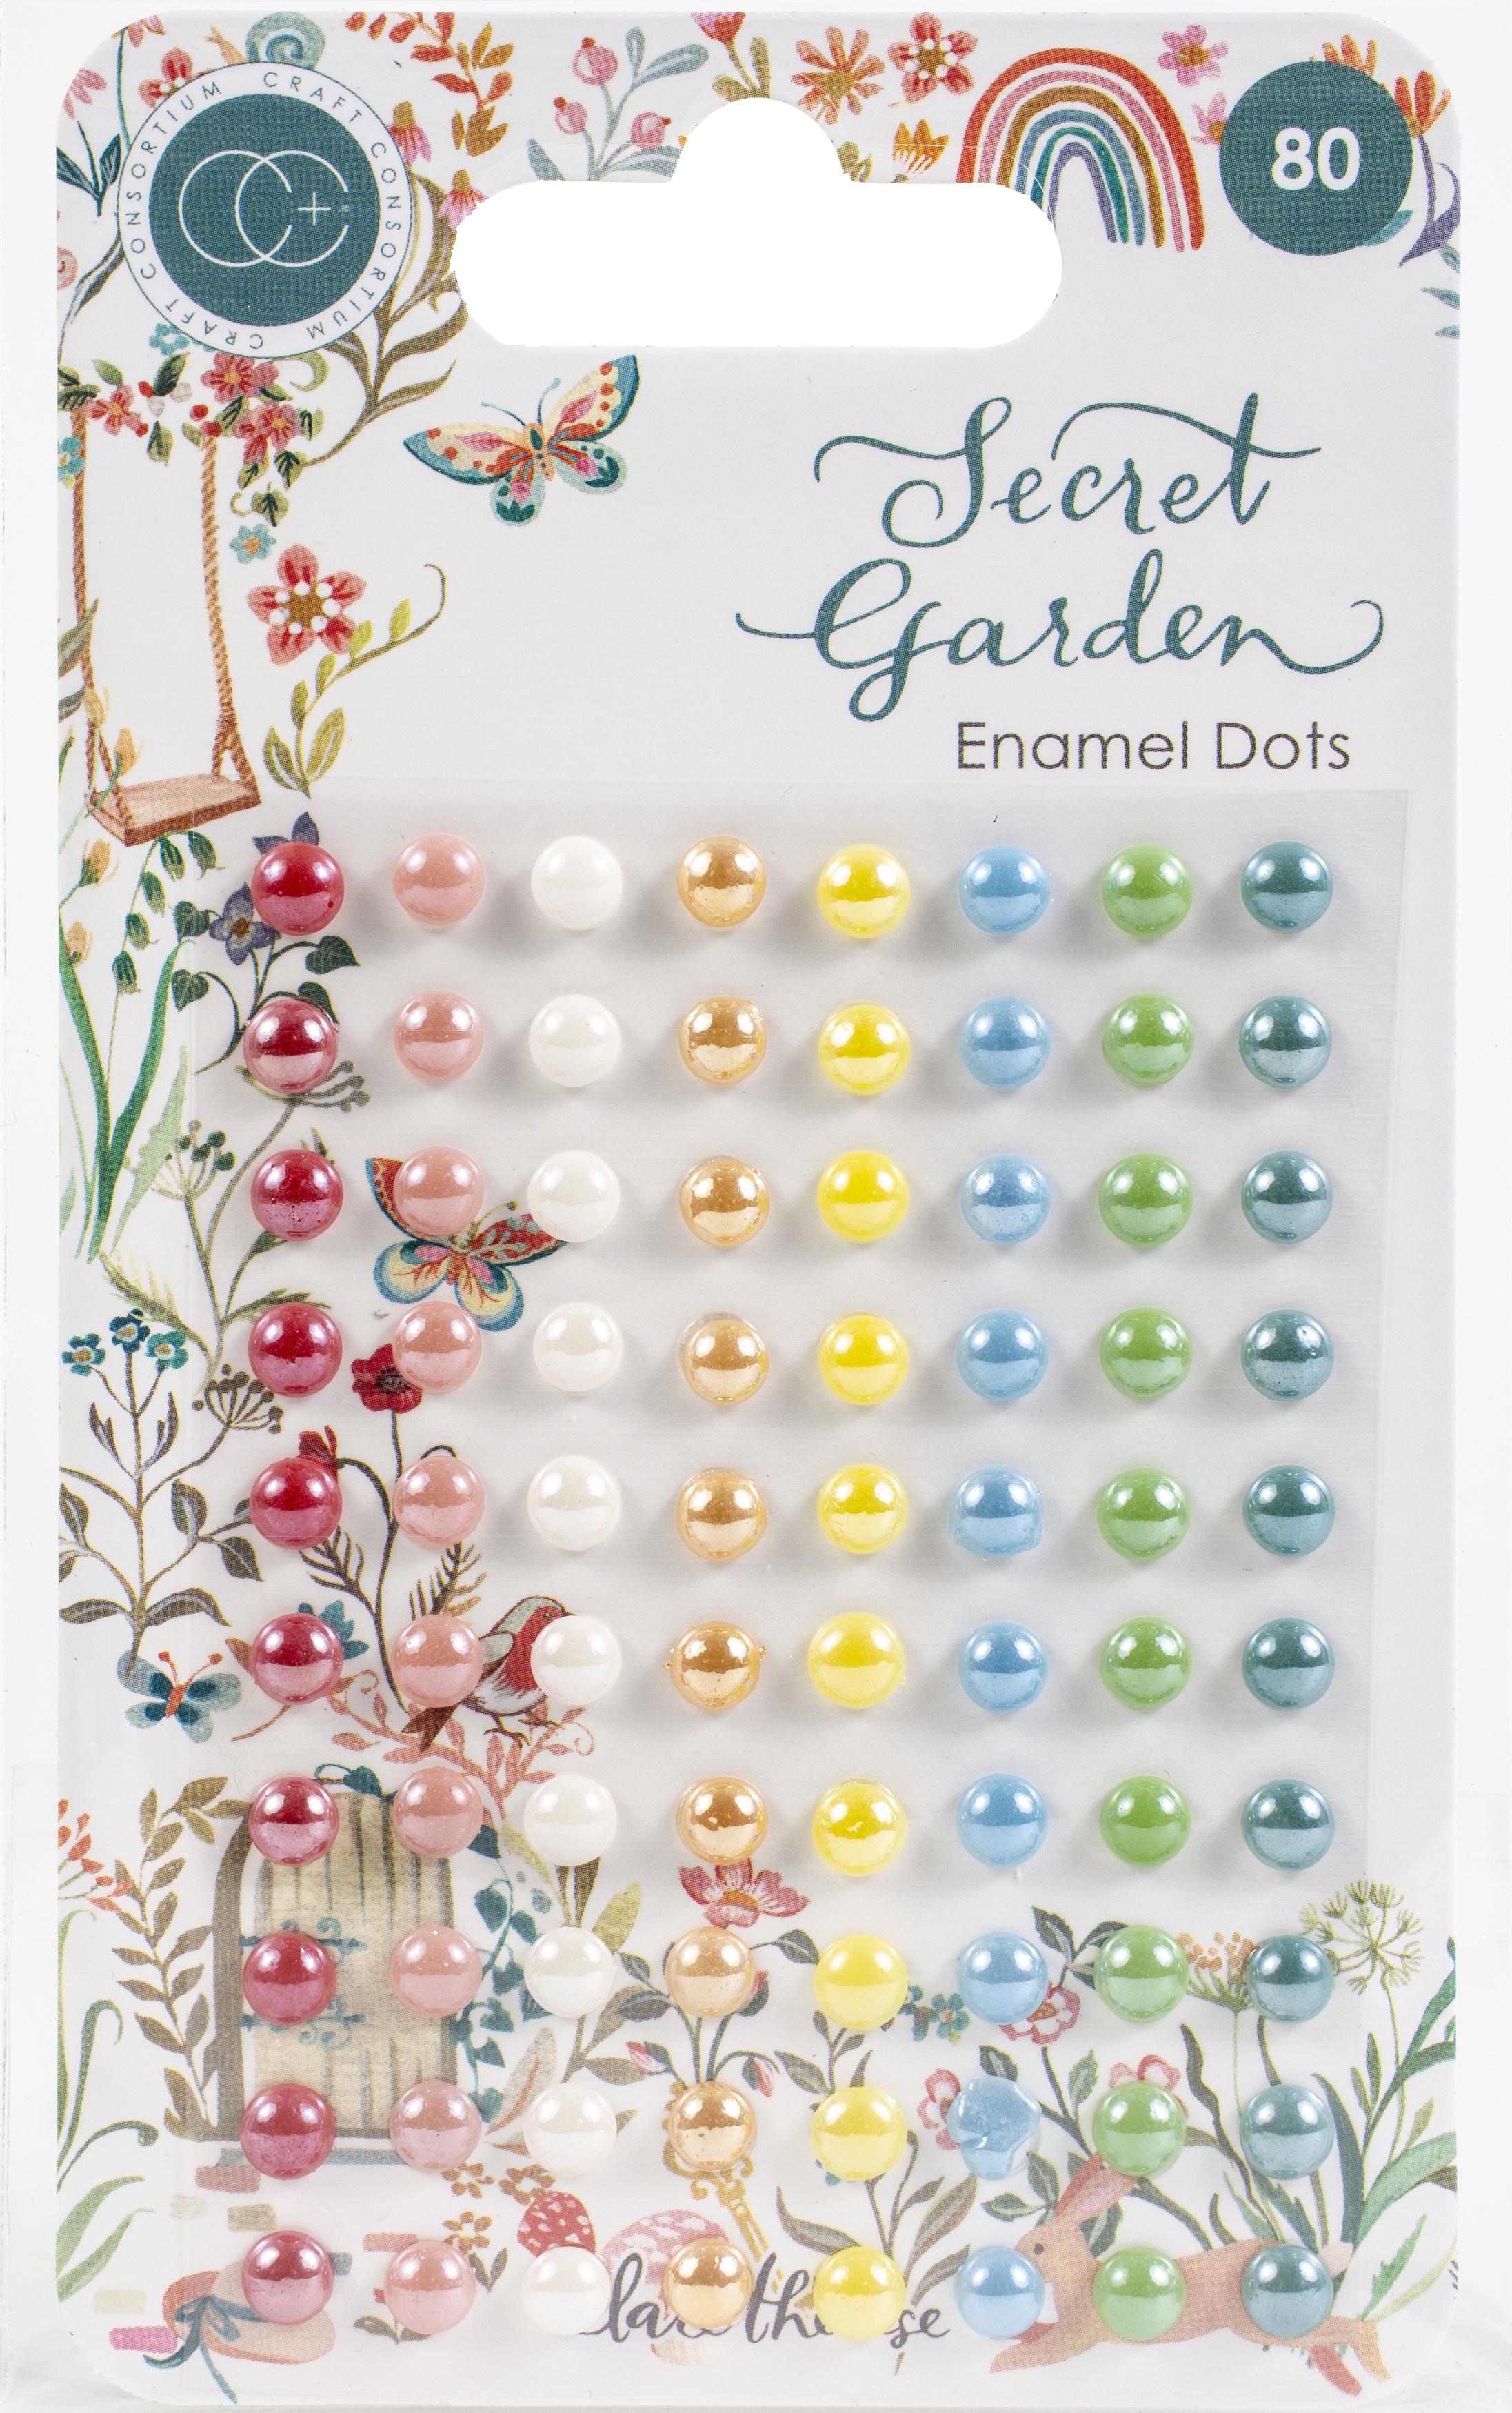 Craft Consortium - Secret Garden - Enamel Dots